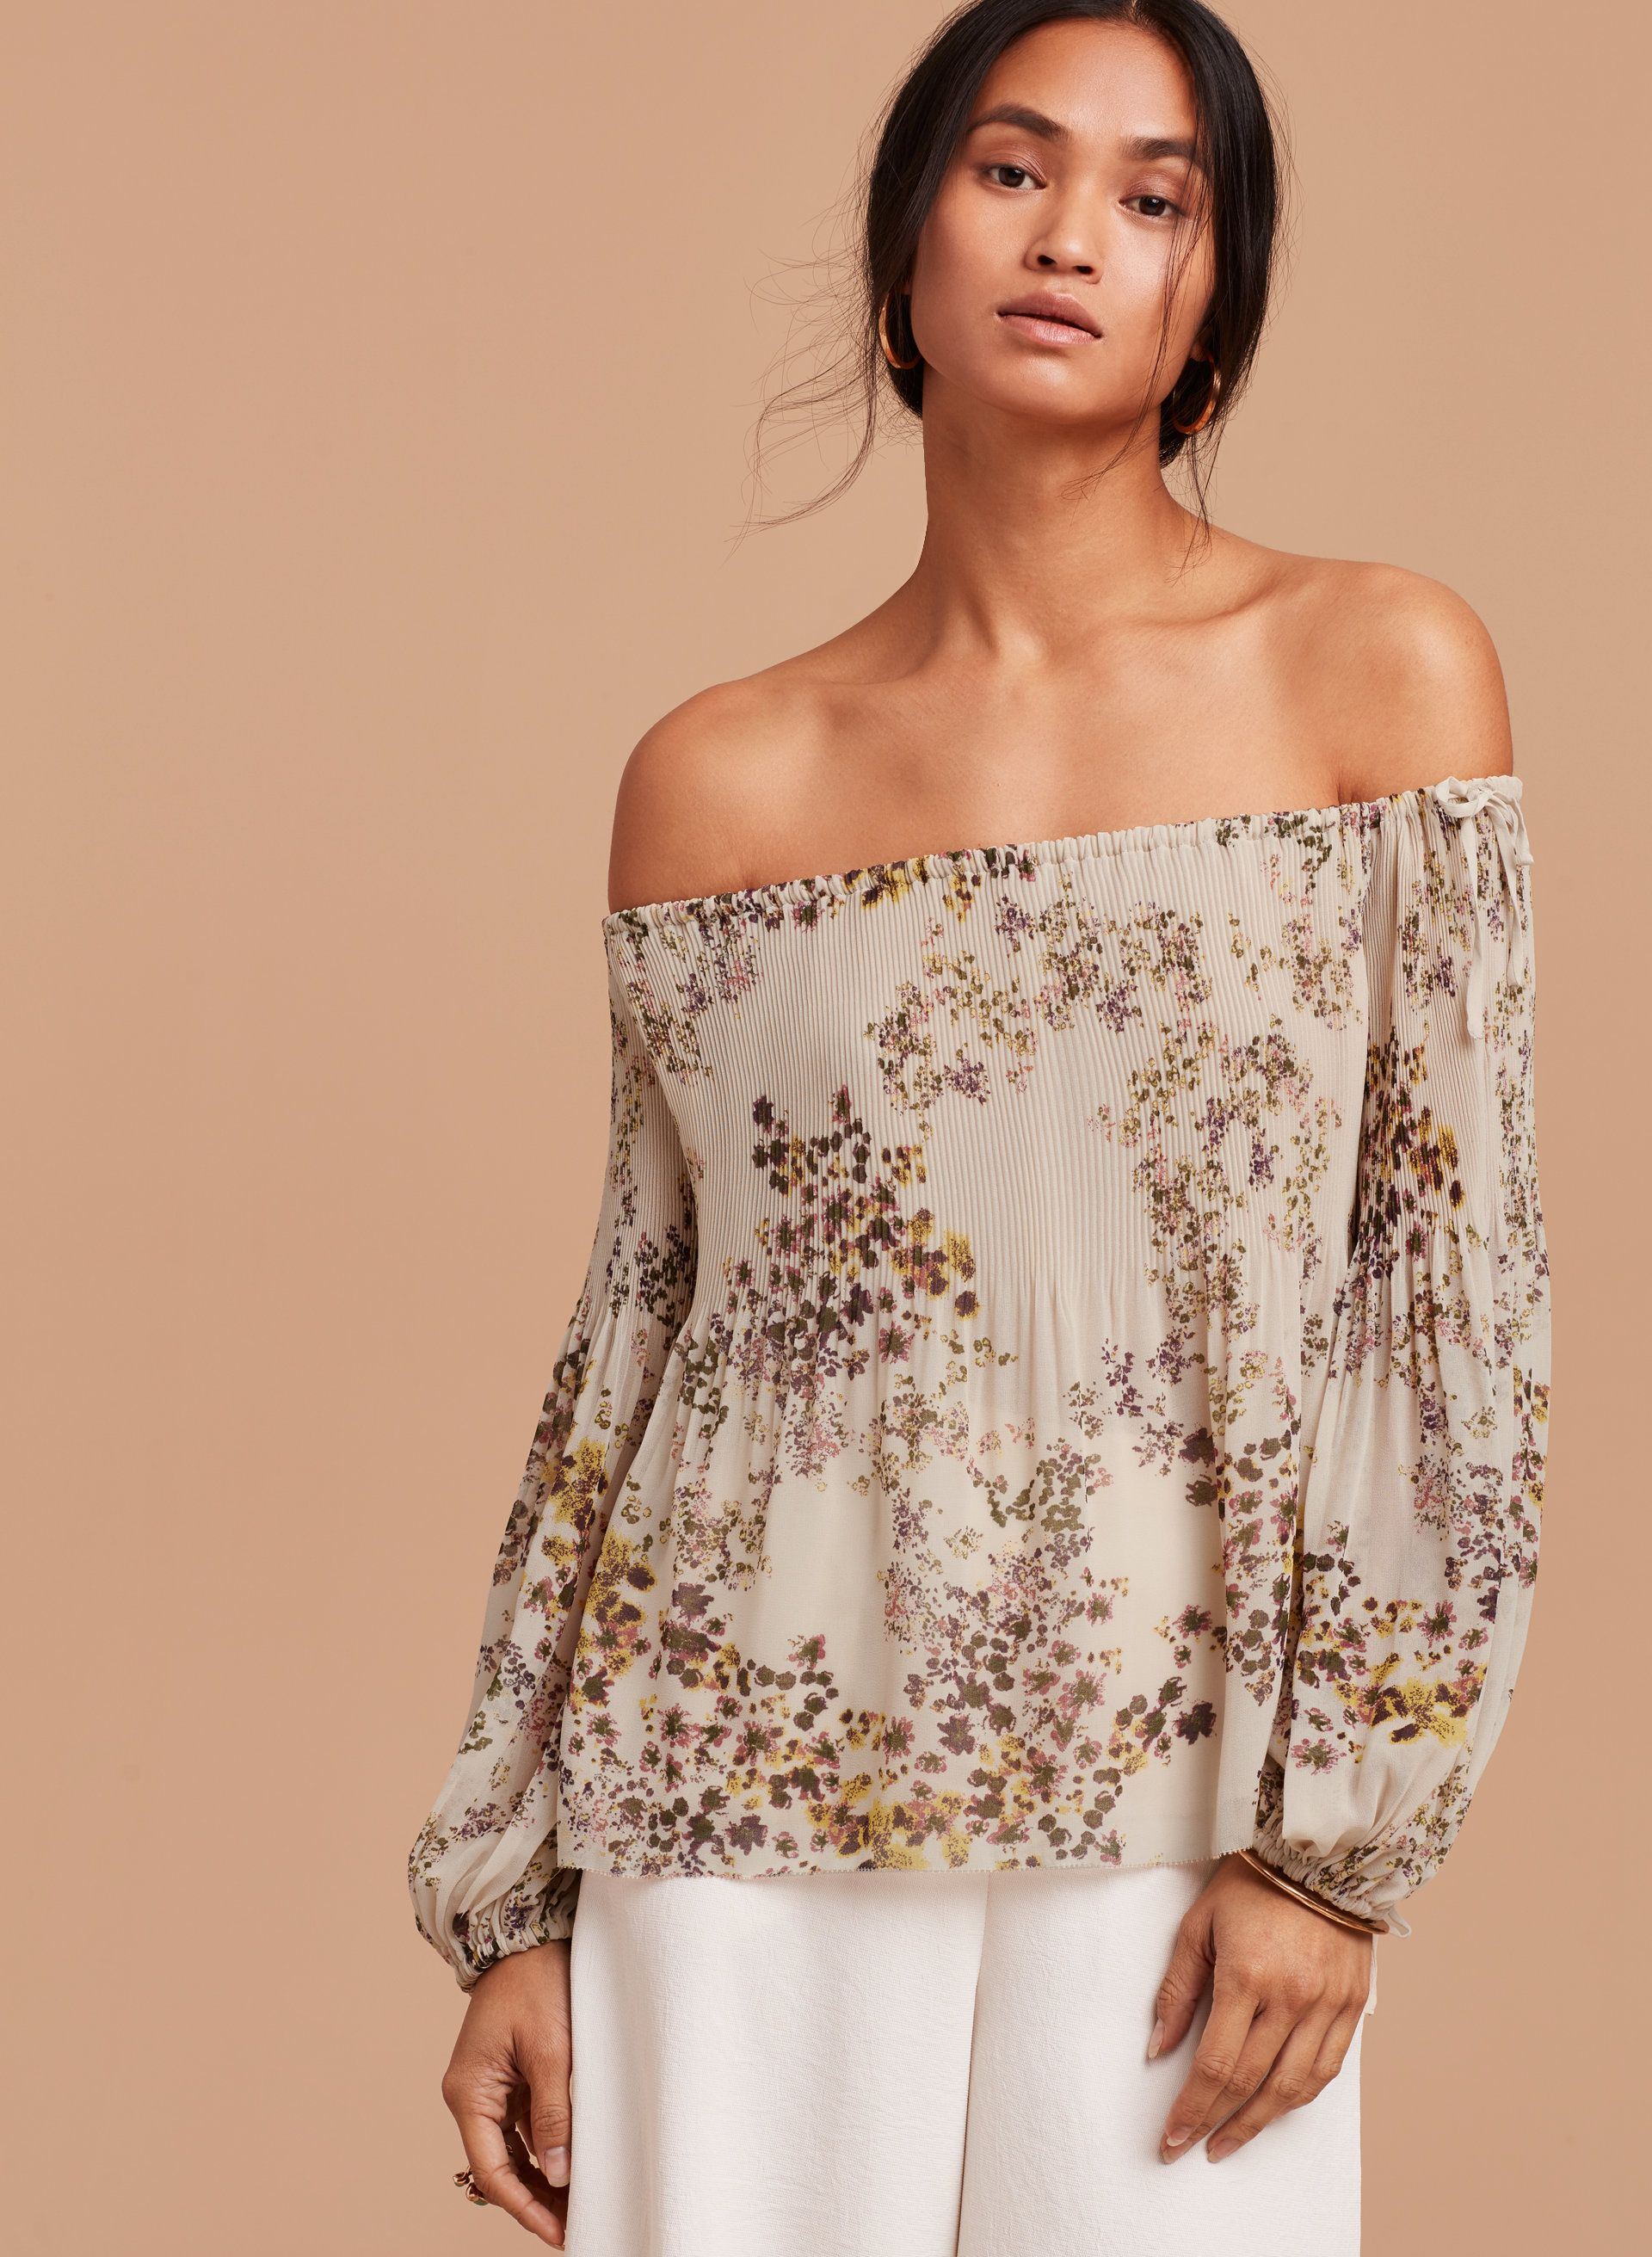 f5d23f81a556af Talence blouse